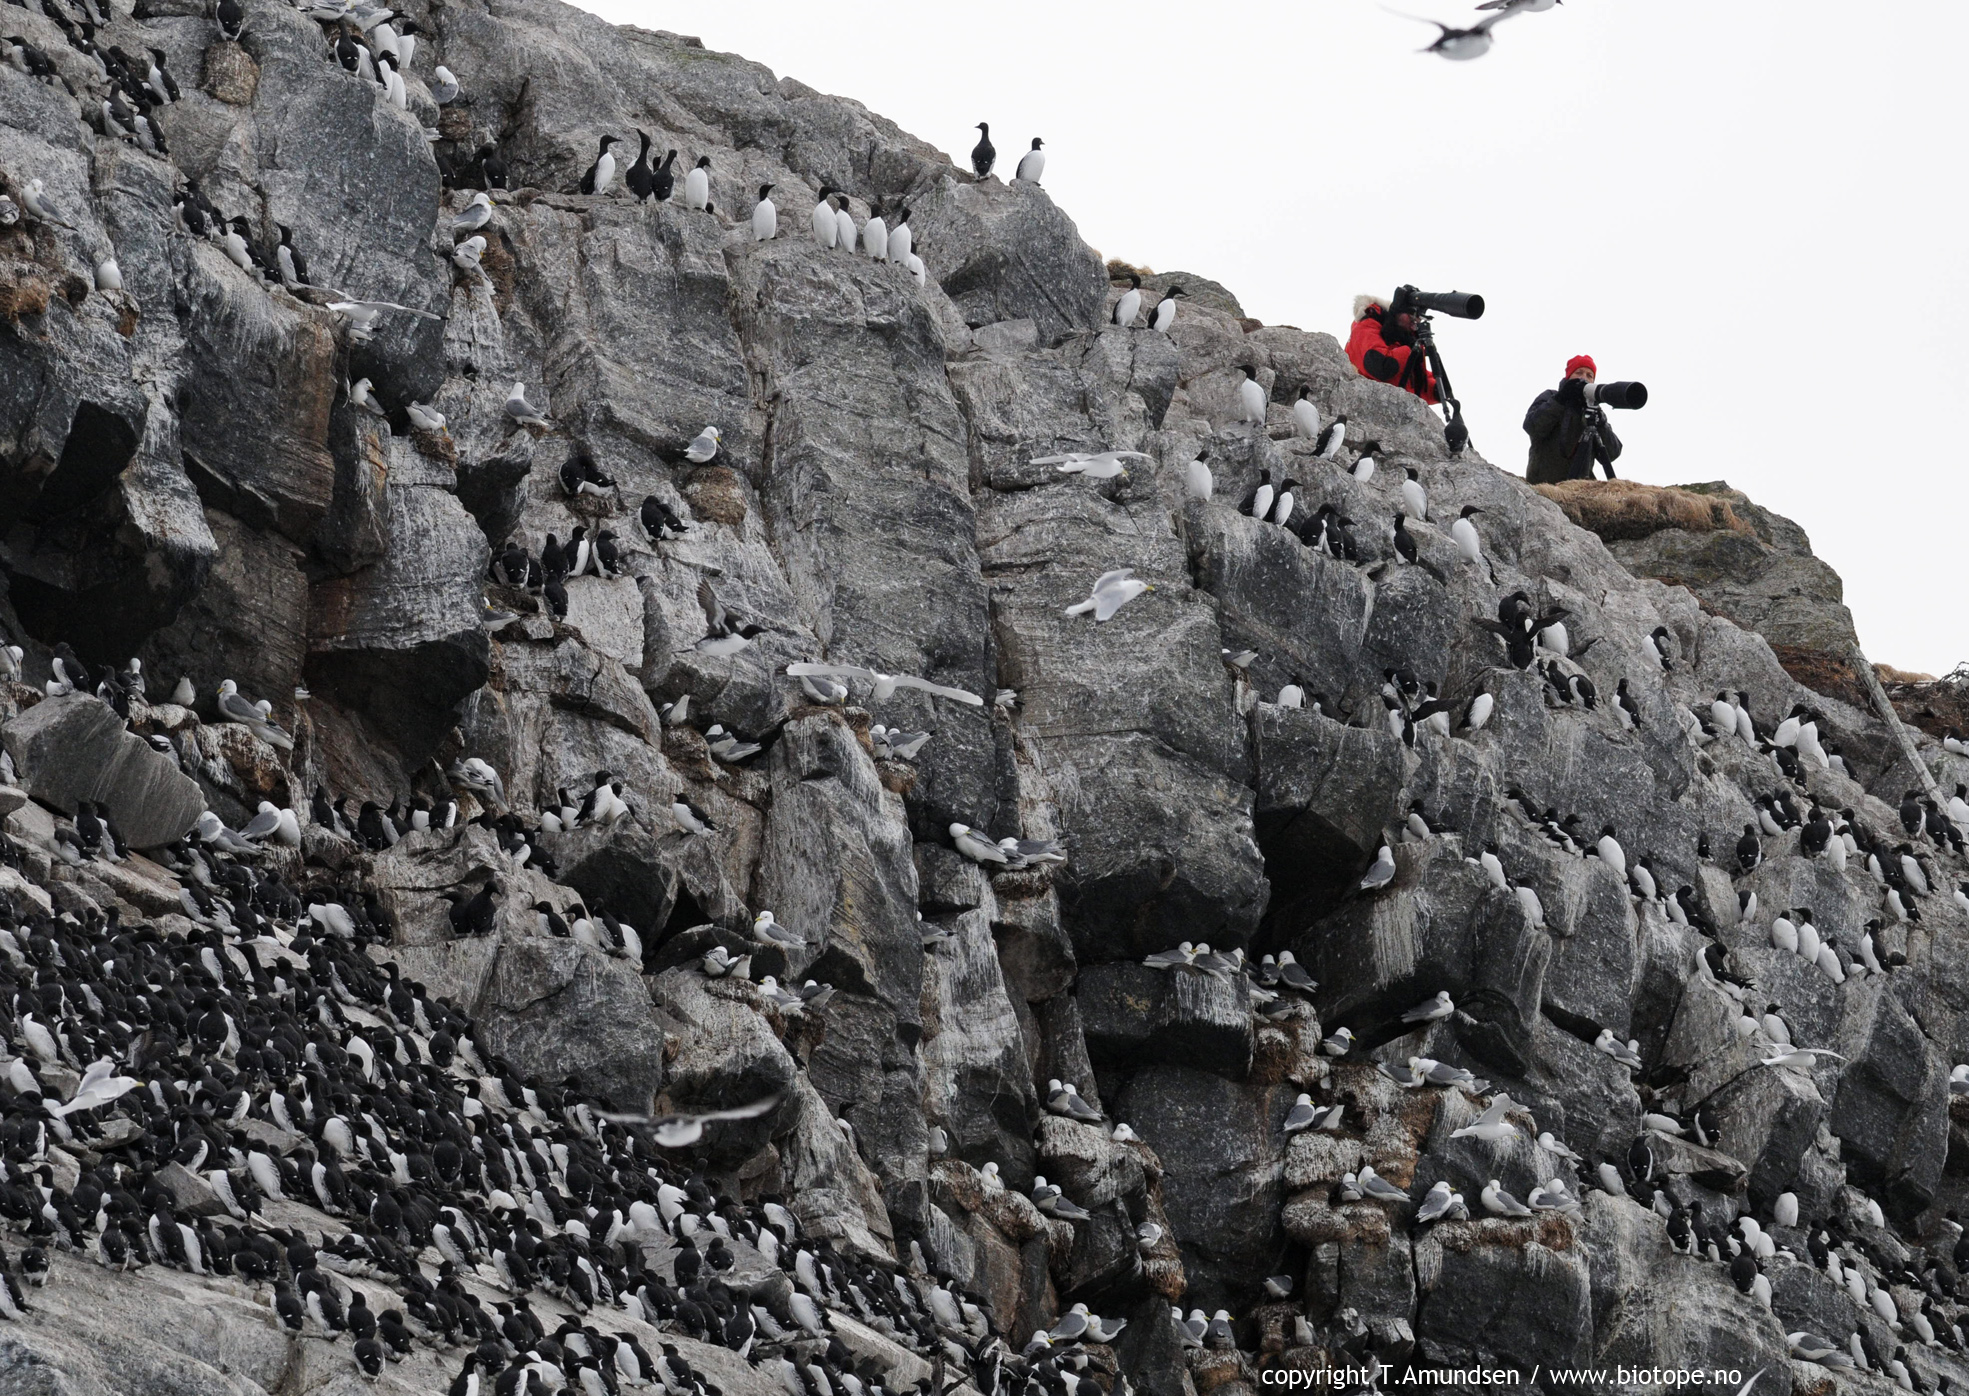 hornoya bird cliff mrch2011 TAmundsen Biotope .jpg